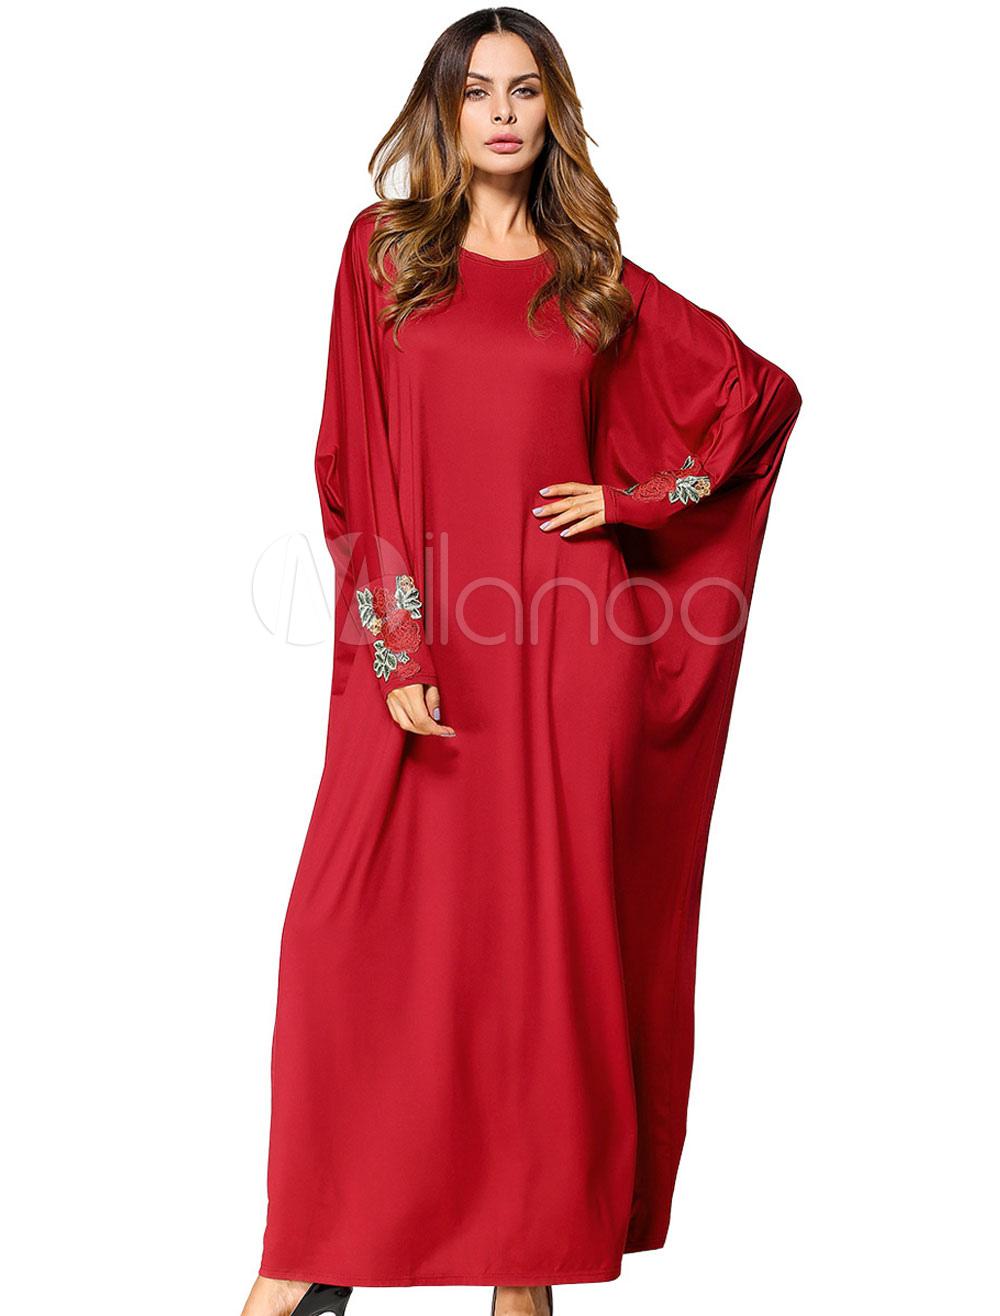 Women Kaftan Dress Red Floral Long Sleeve Batwing Oversized Jalabiya Dress (Women\\'s Clothing Arabian Clothing) photo